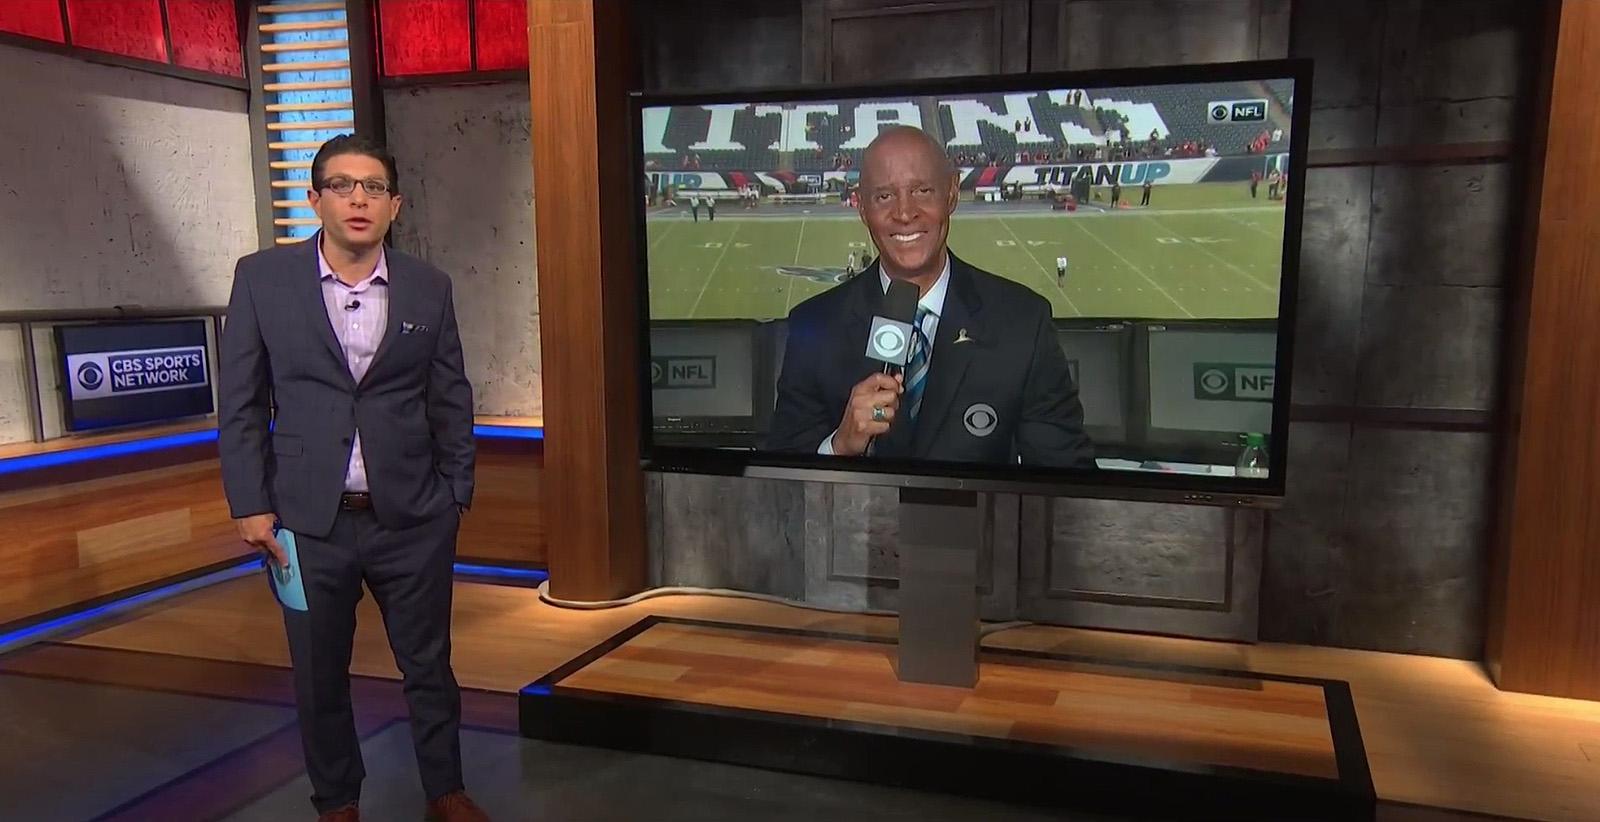 NCS_CBS-Sports-Network-Studio-2018_0015